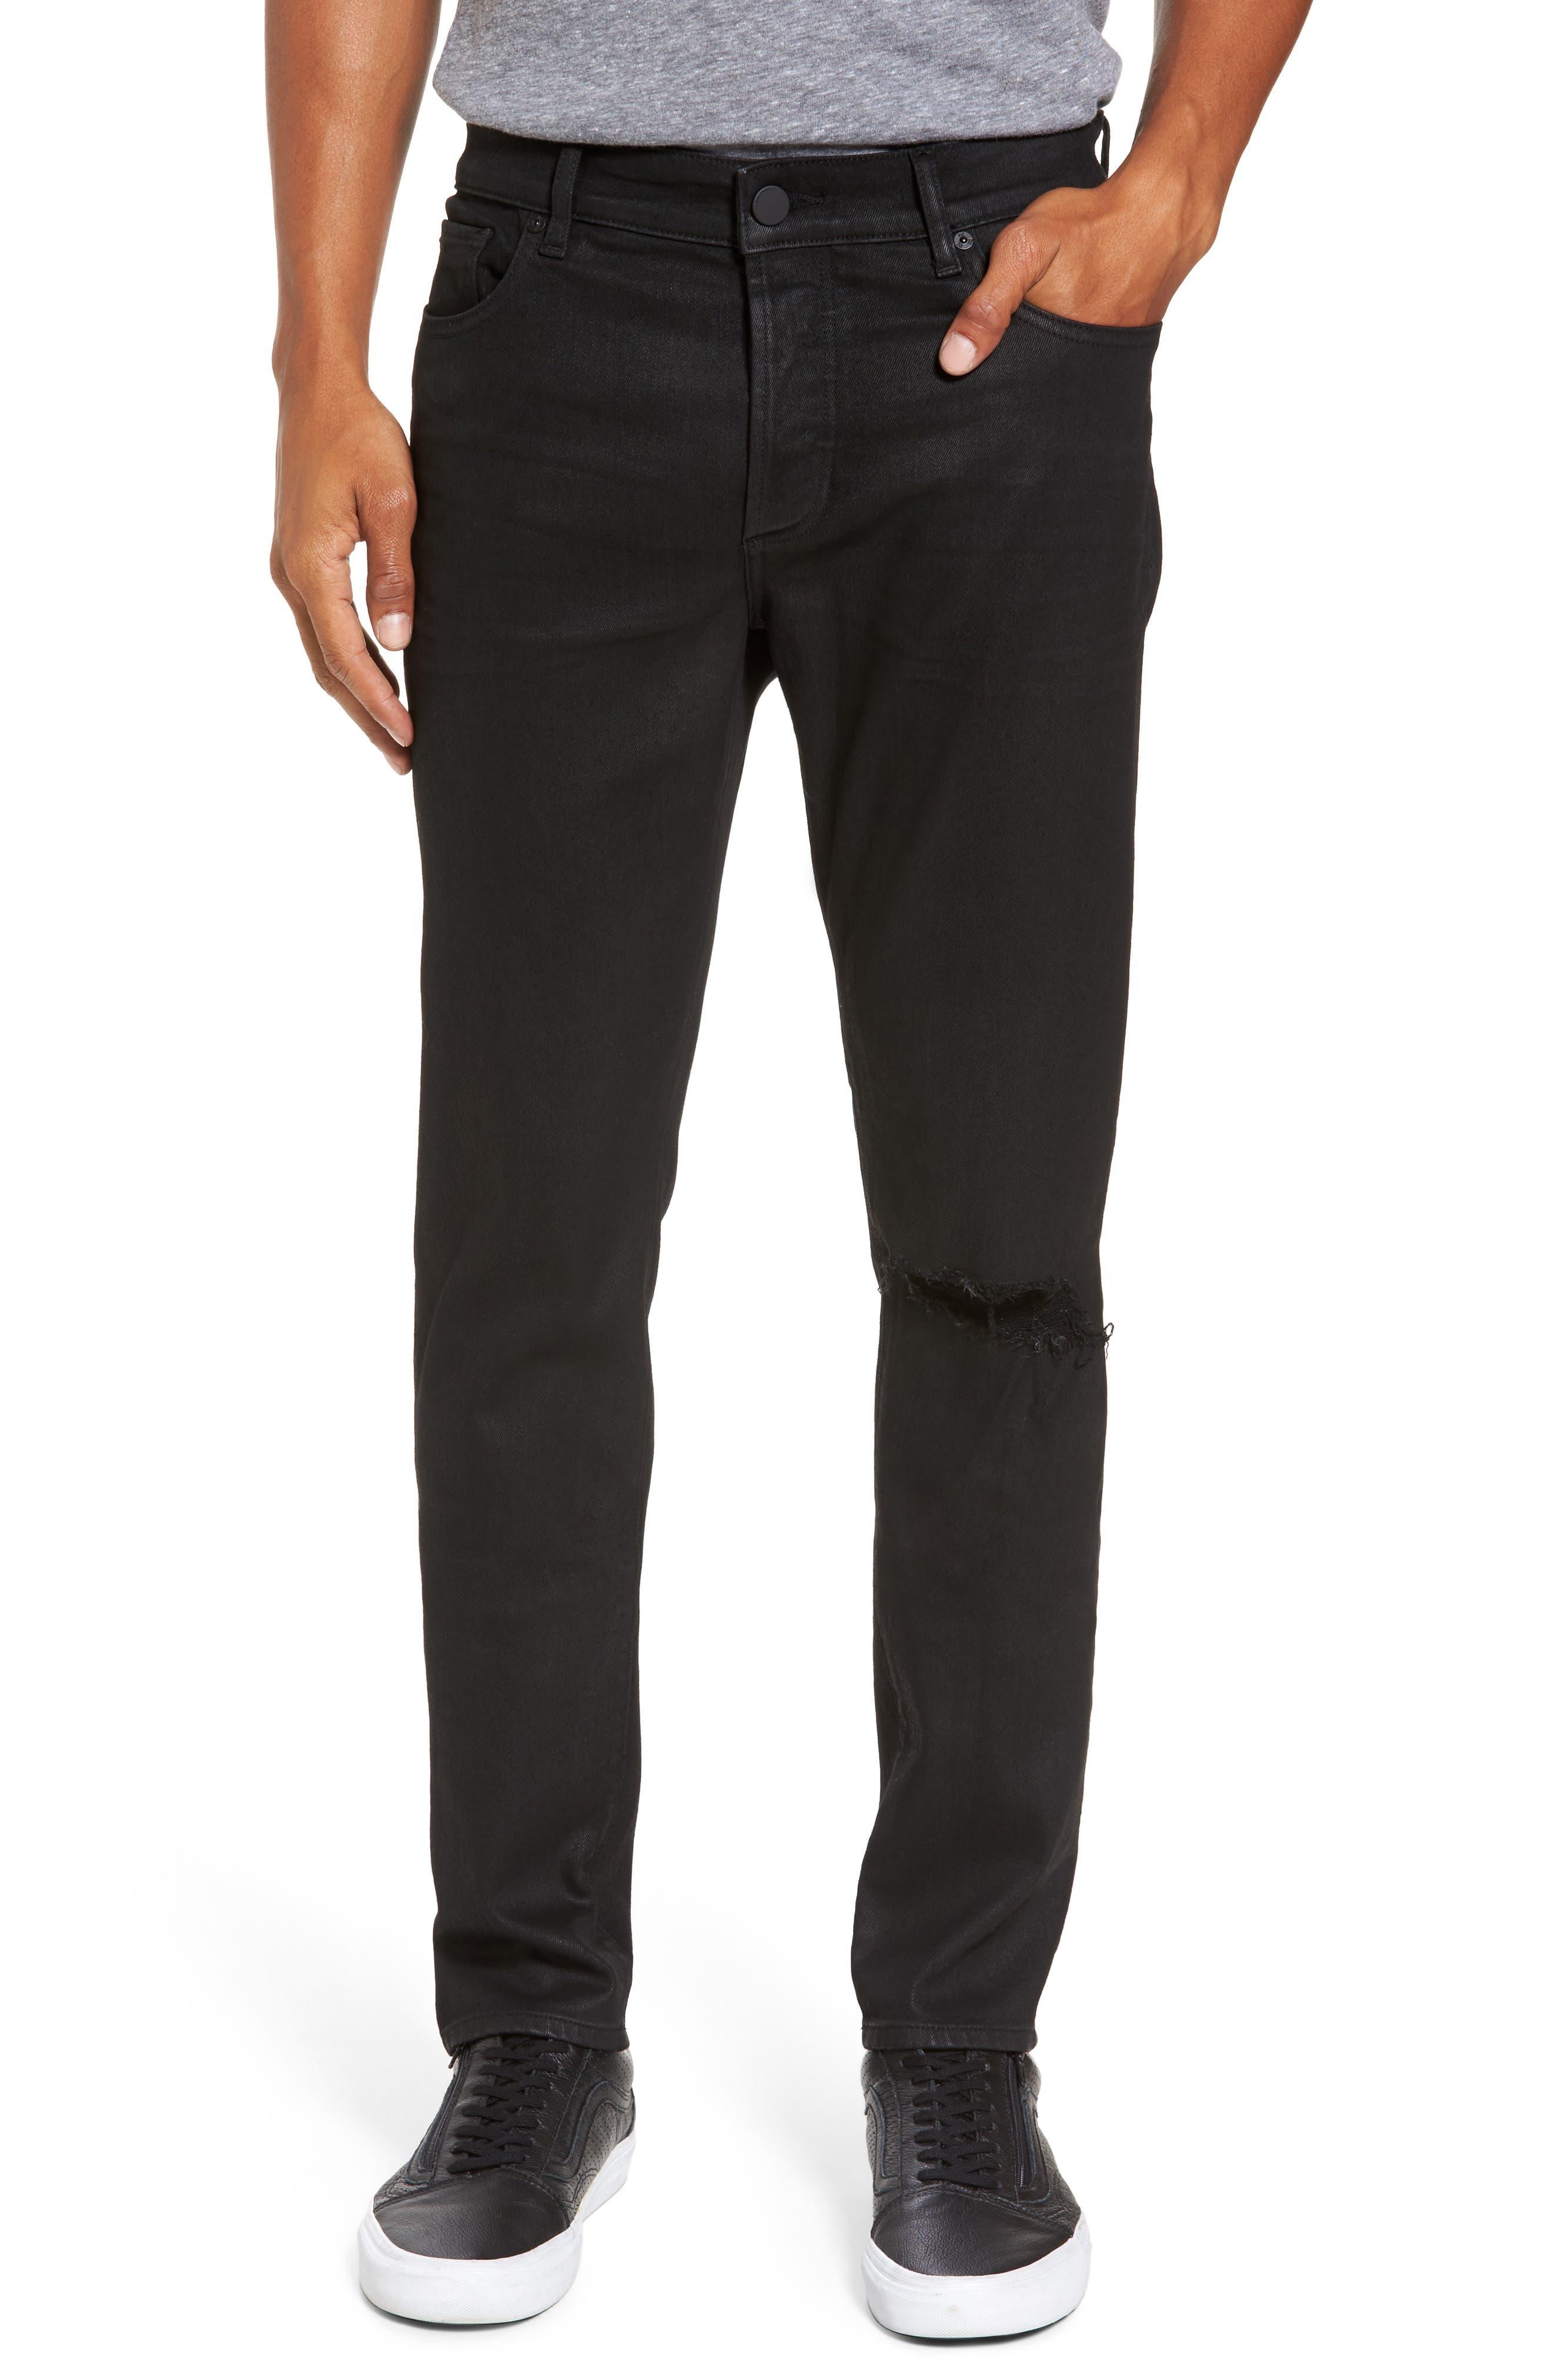 Hunter Skinny Jeans,                             Main thumbnail 1, color,                             VICE